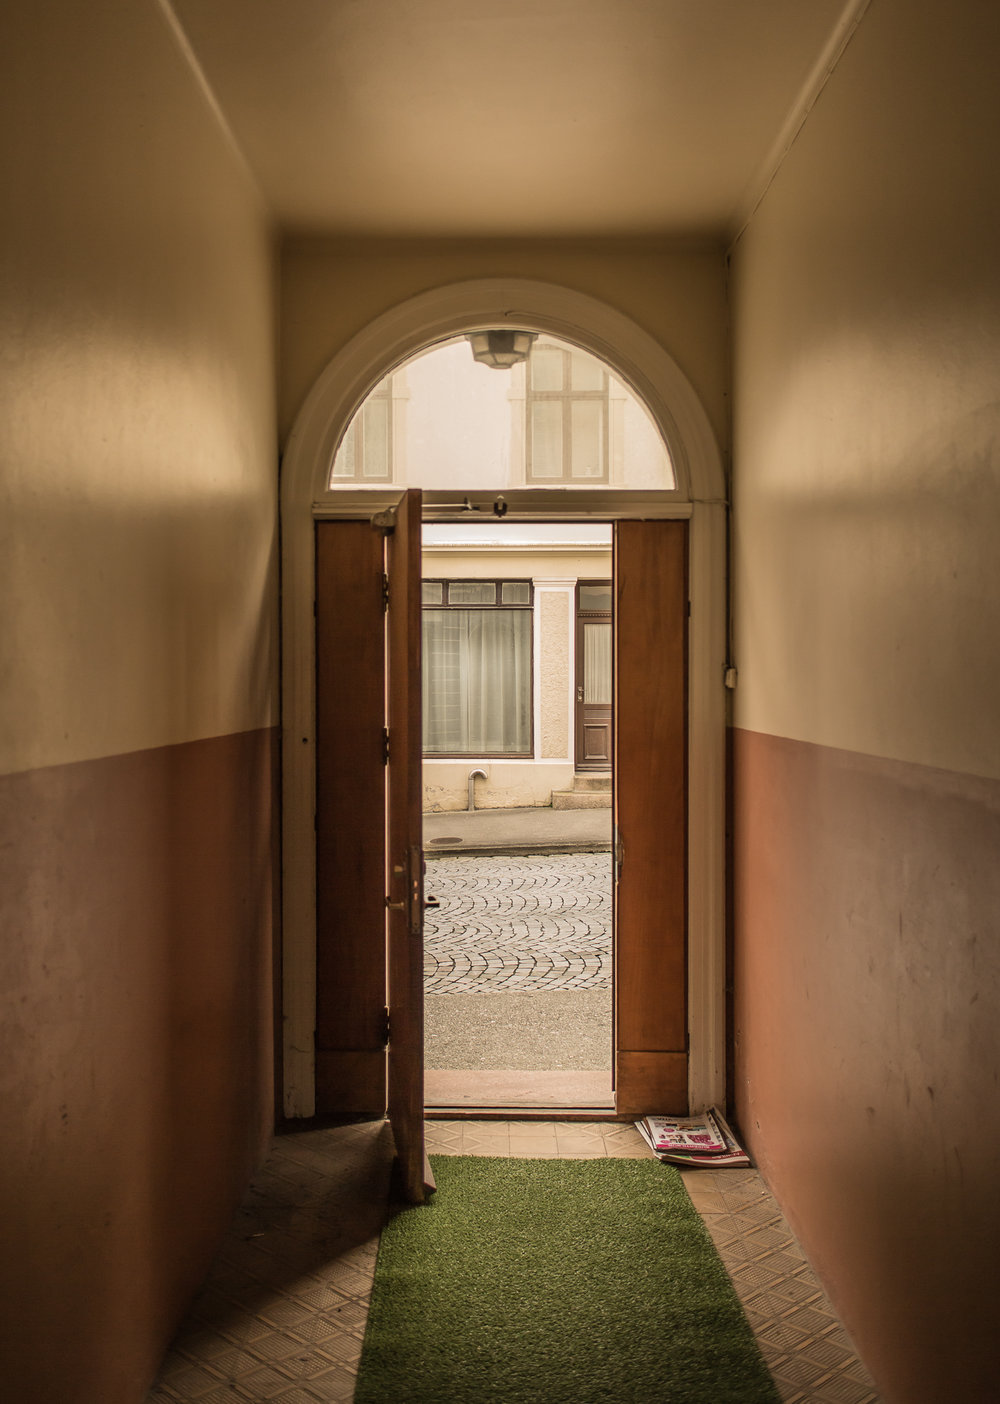 Kaela-Speicher-PhotographyEY1A6184.jpg